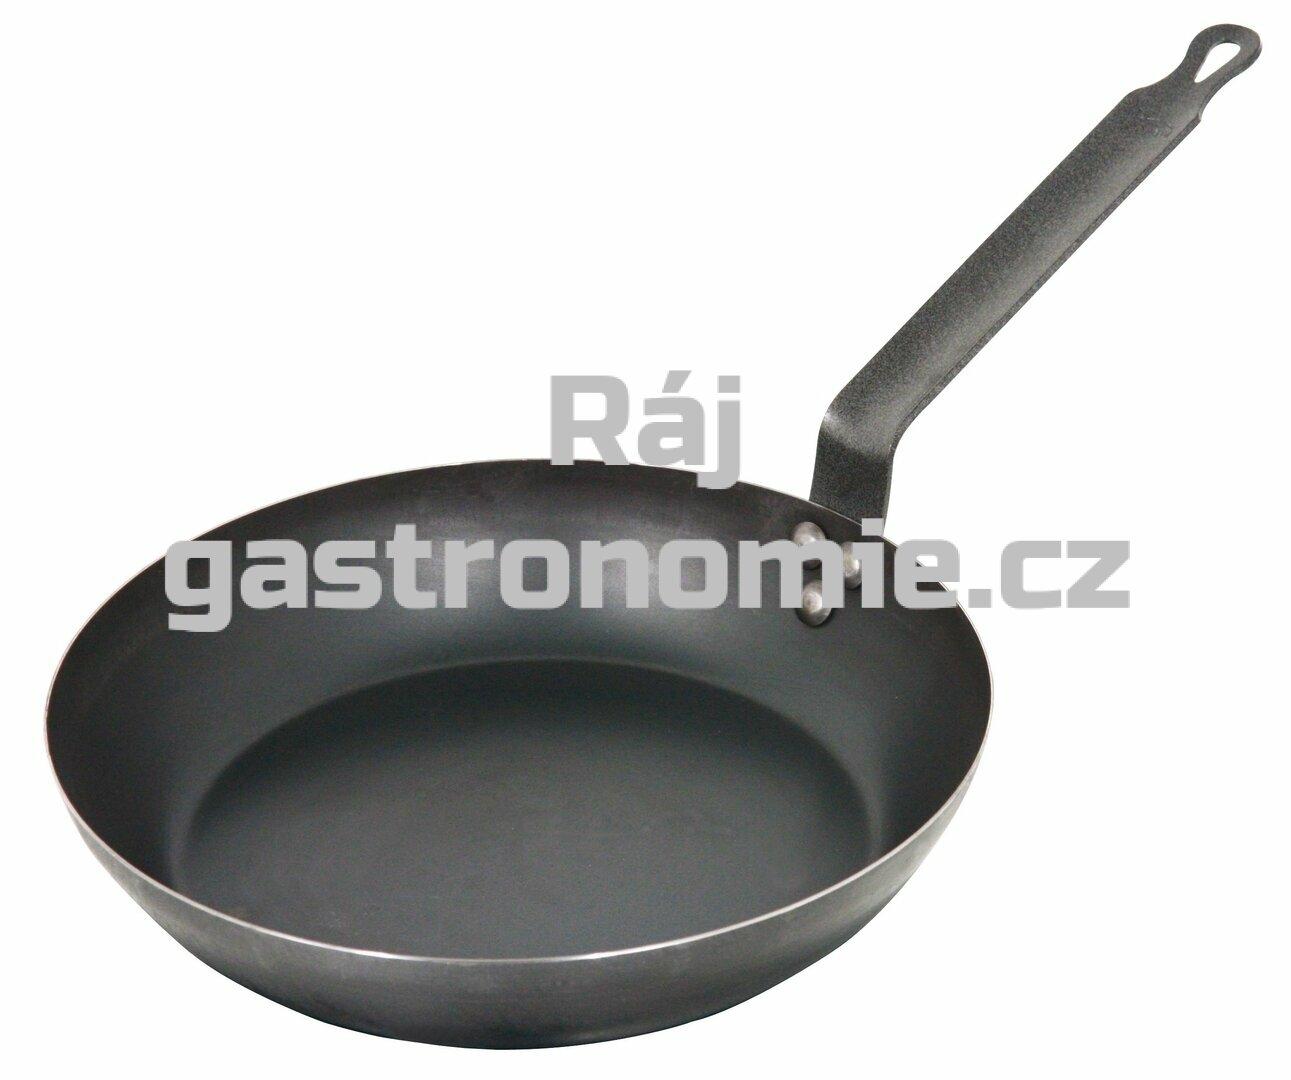 Pánev (Ø320 mm, hmotnost 1,25kg)